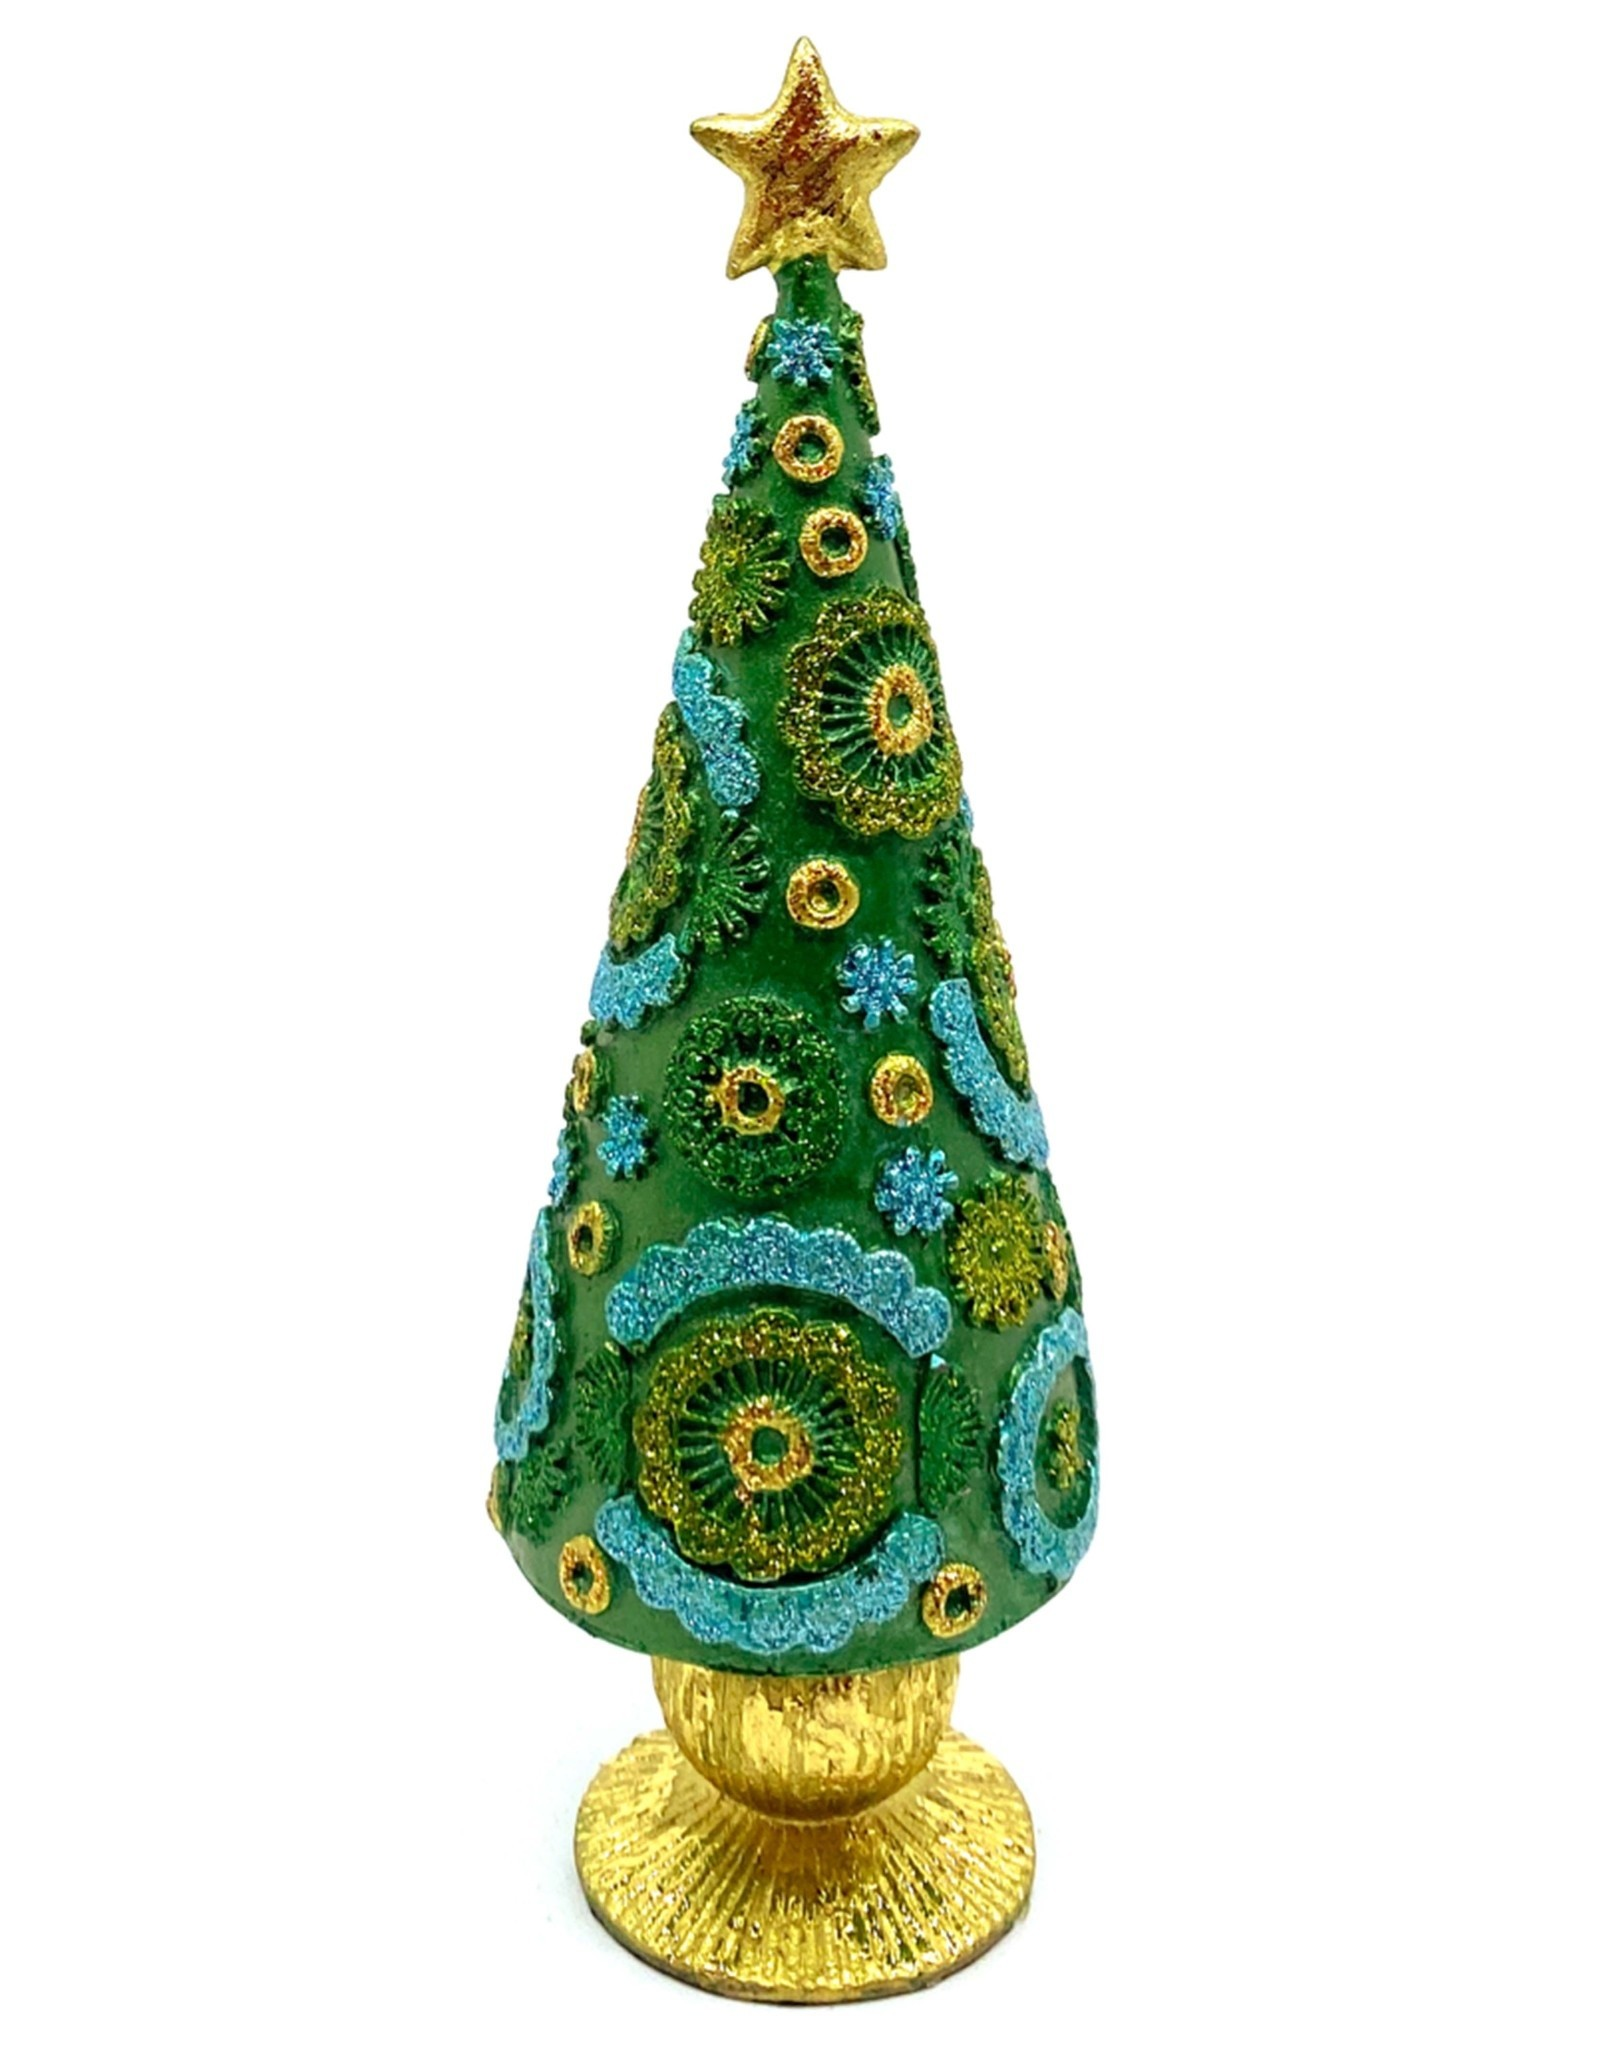 DEKORASYON SMALL BLOSSOM CONE TREE WITH STAR